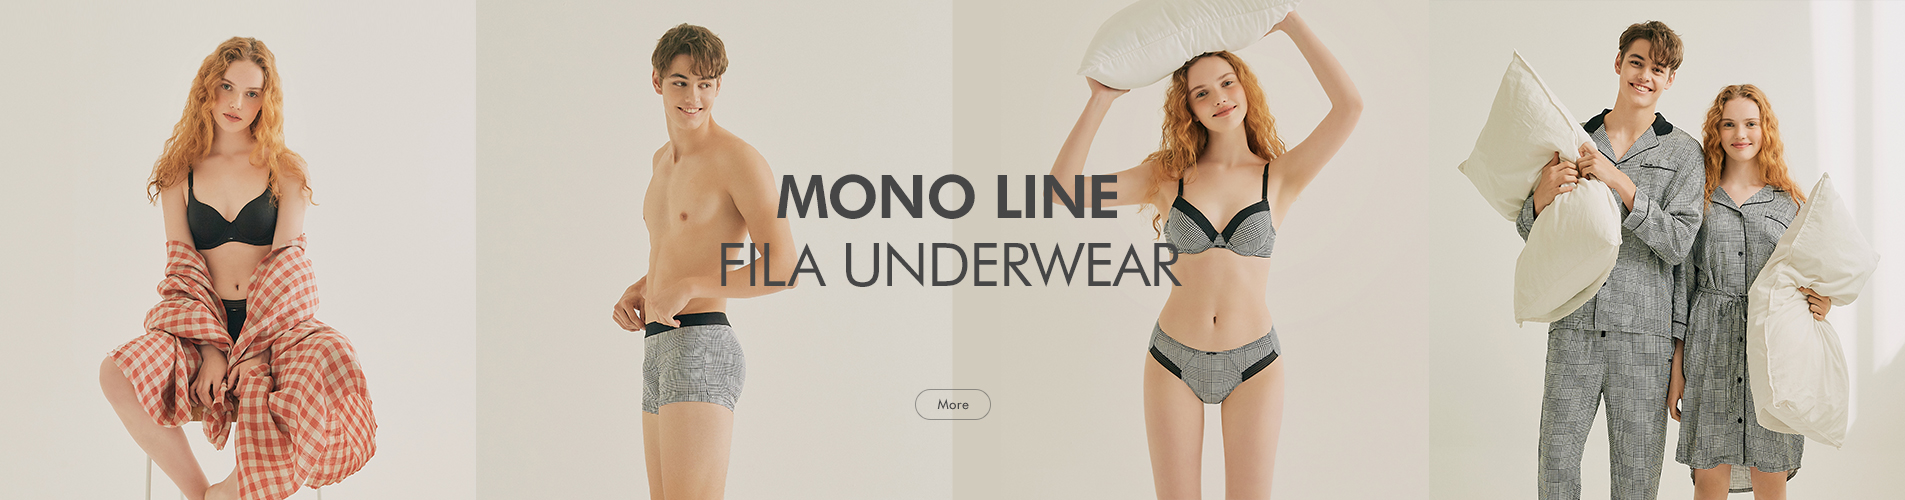 MONO LINE FILA UNDERWEAR